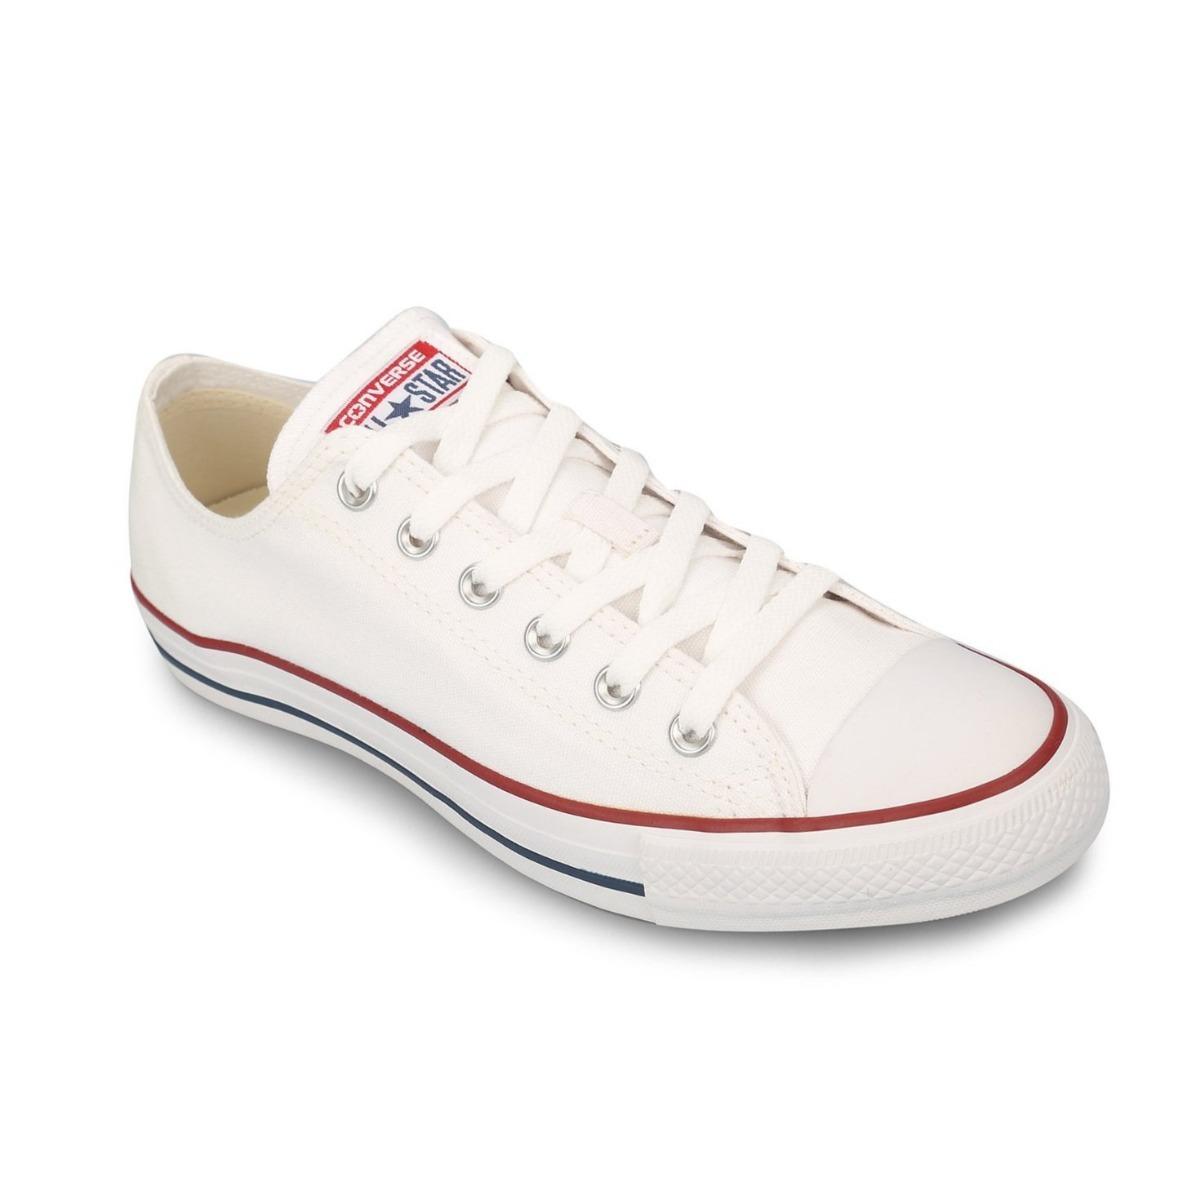 703724d7d2 zapatillas converse all star chuck taylor blancas unisex. Cargando zoom.